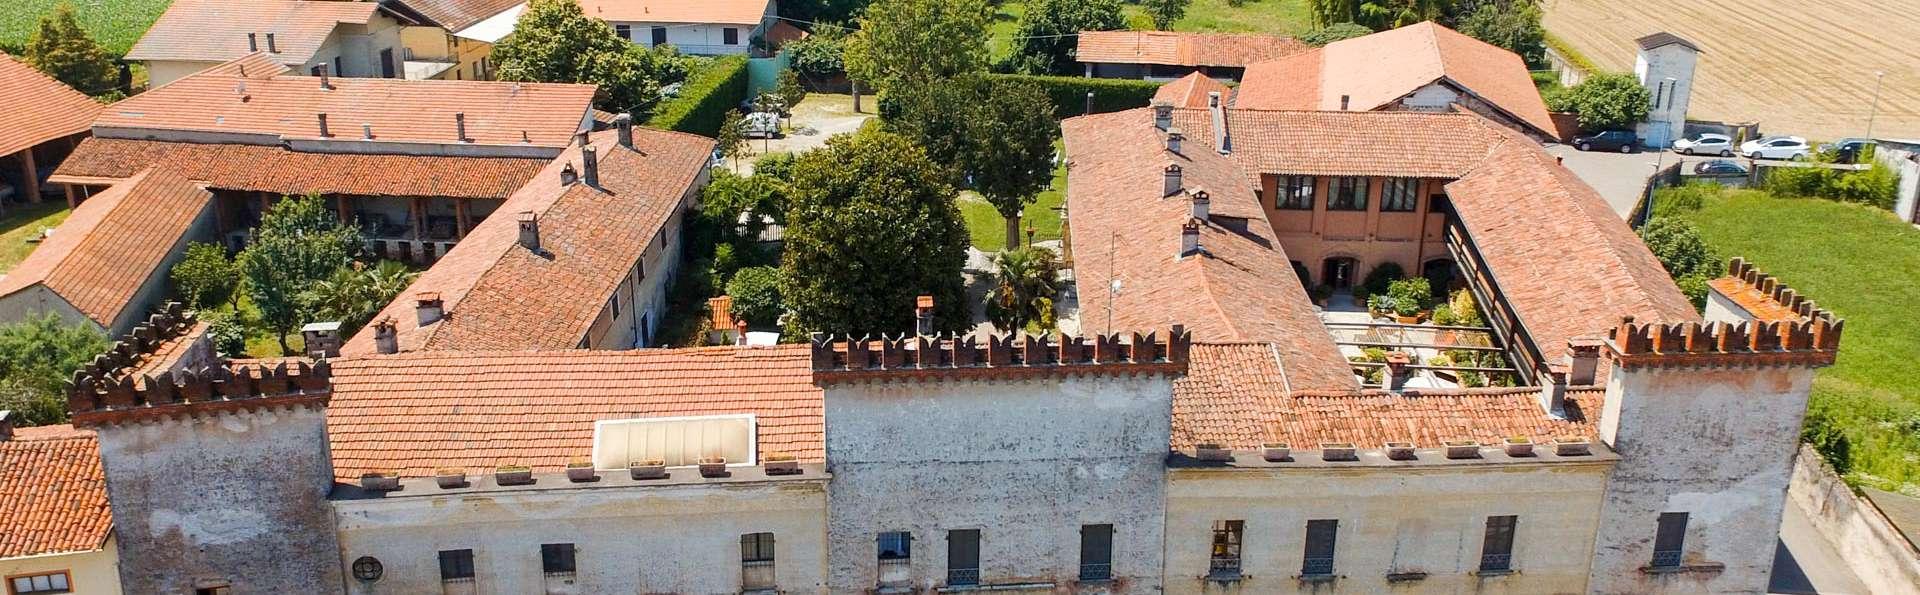 Hotel Tenimento Al Castello - EDIT_AERIAL_02.jpg